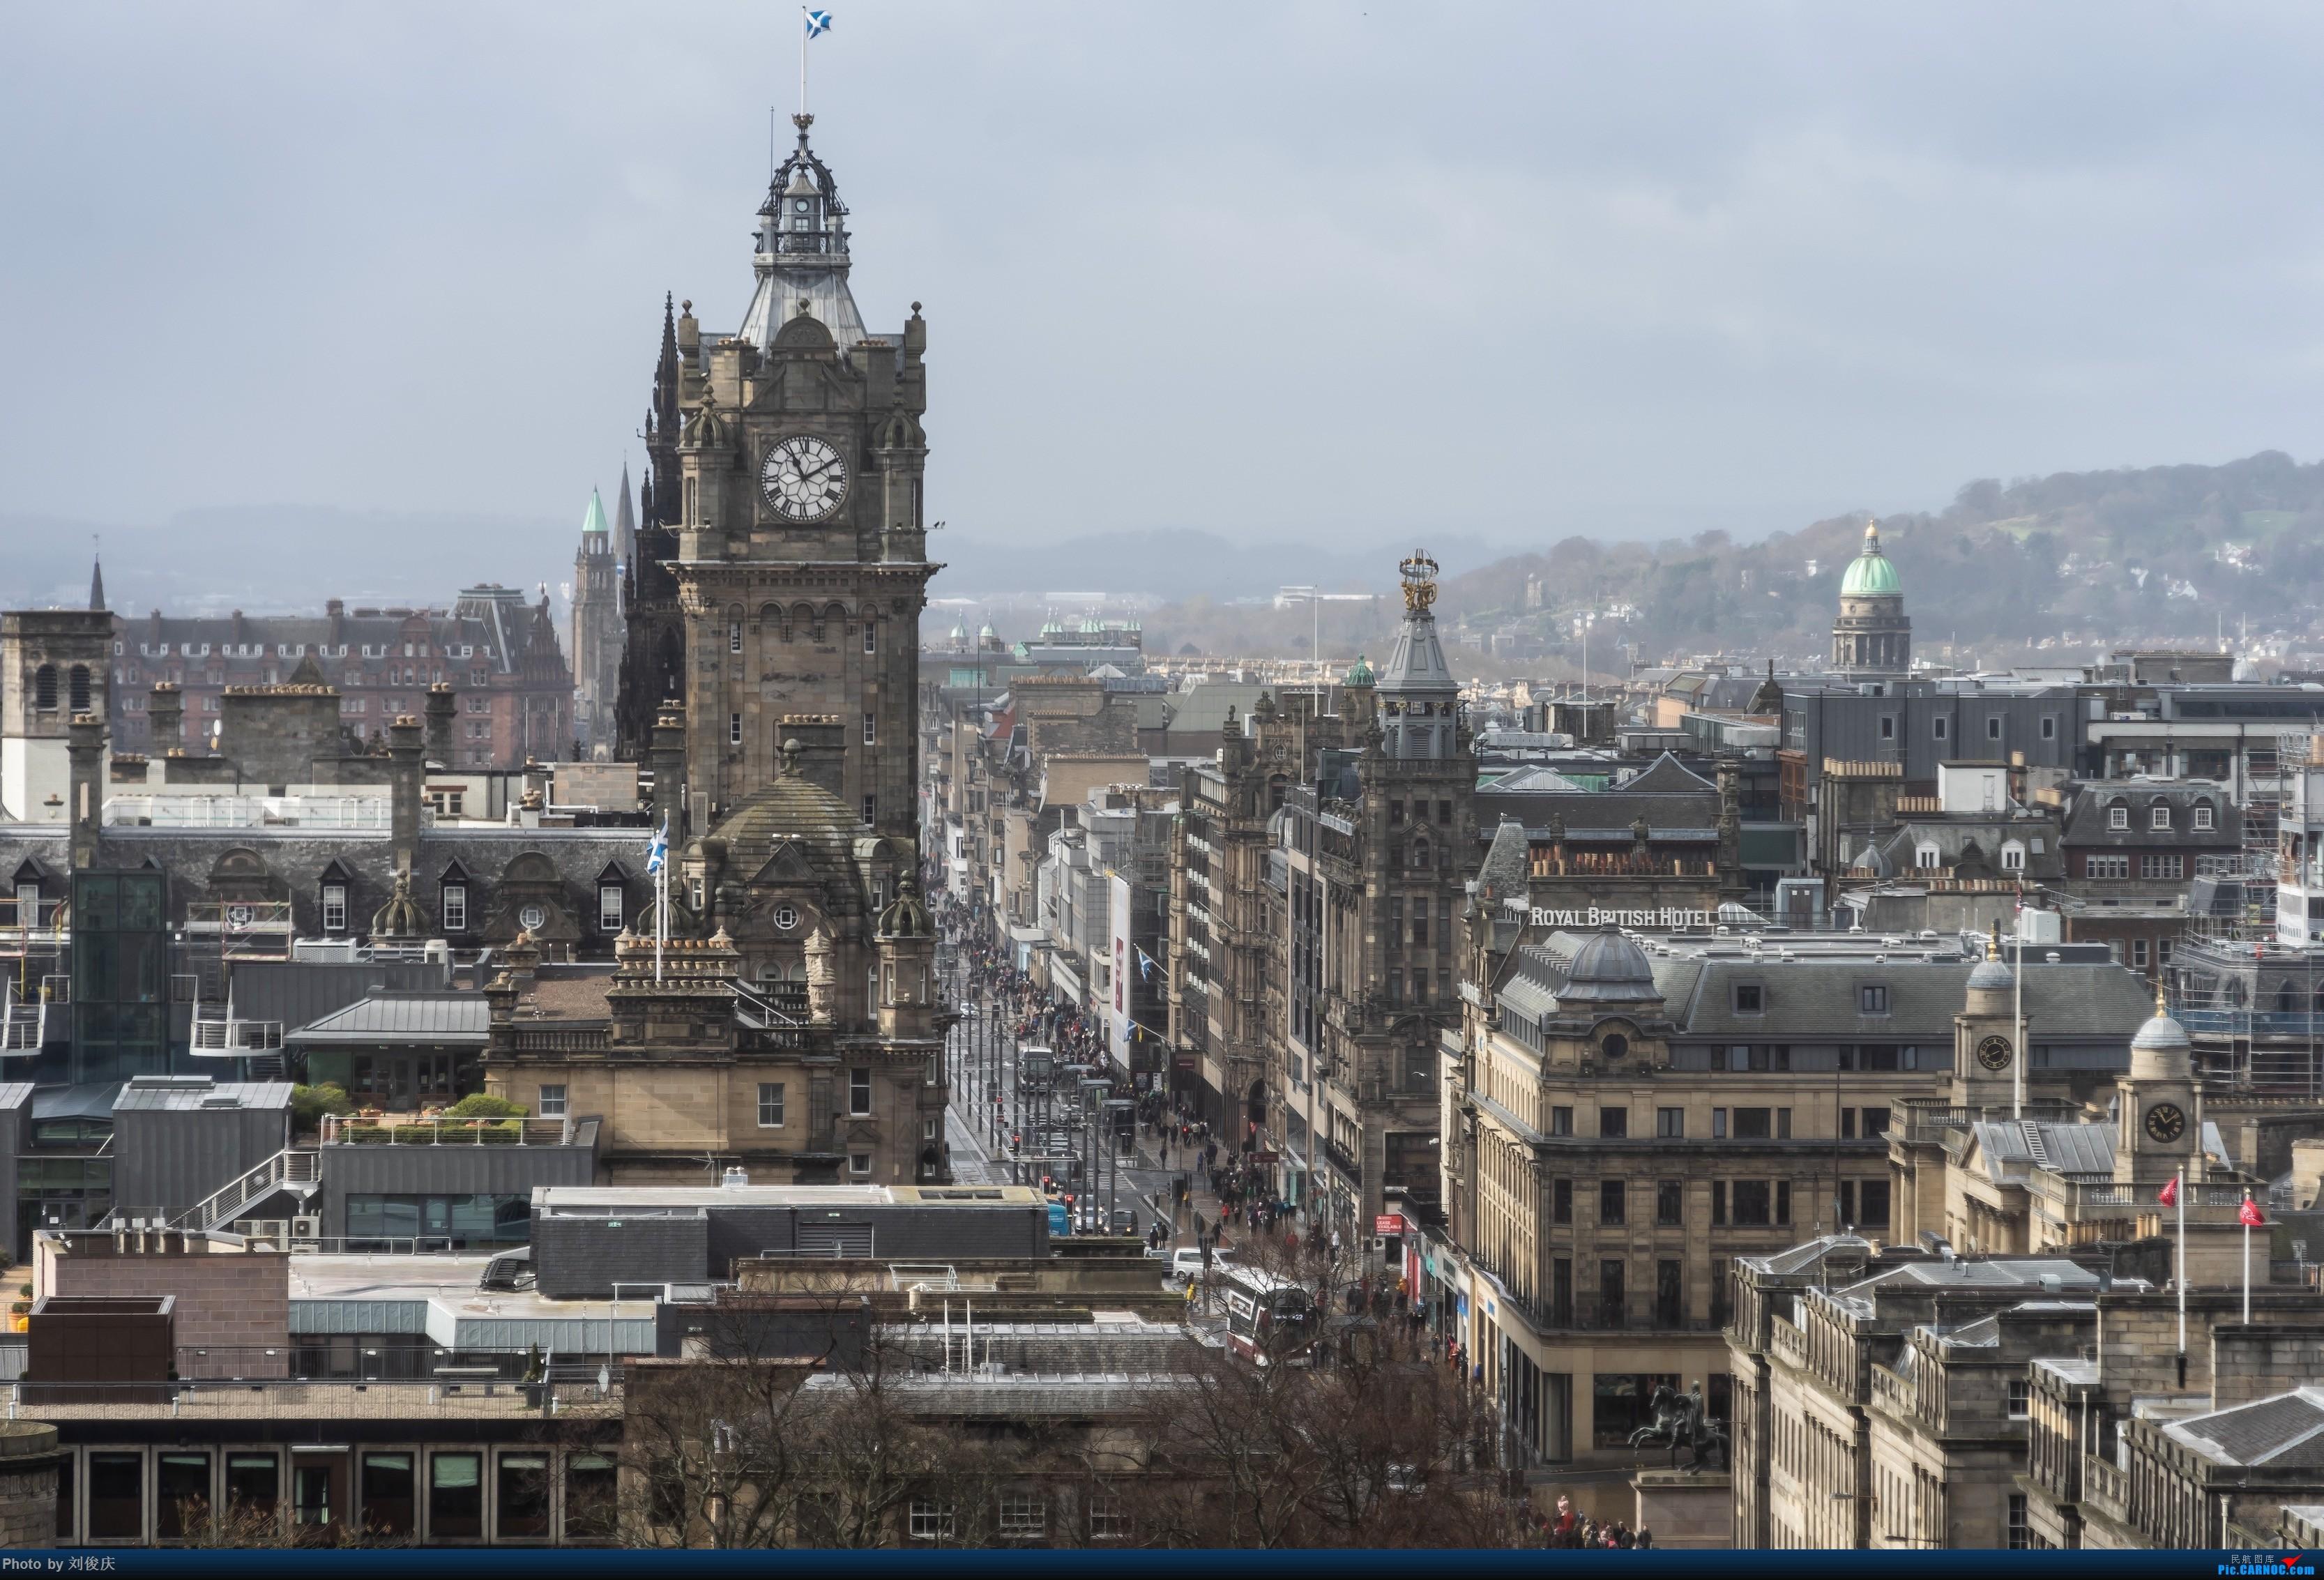 Re:[原创]SEA-JFK-LHR-CDG-FCO-CDG-LHR-ATL-SEA 8天3国5城暴走游记 [4月11日-更新至LHR] EDINBURGH  Edinburgh